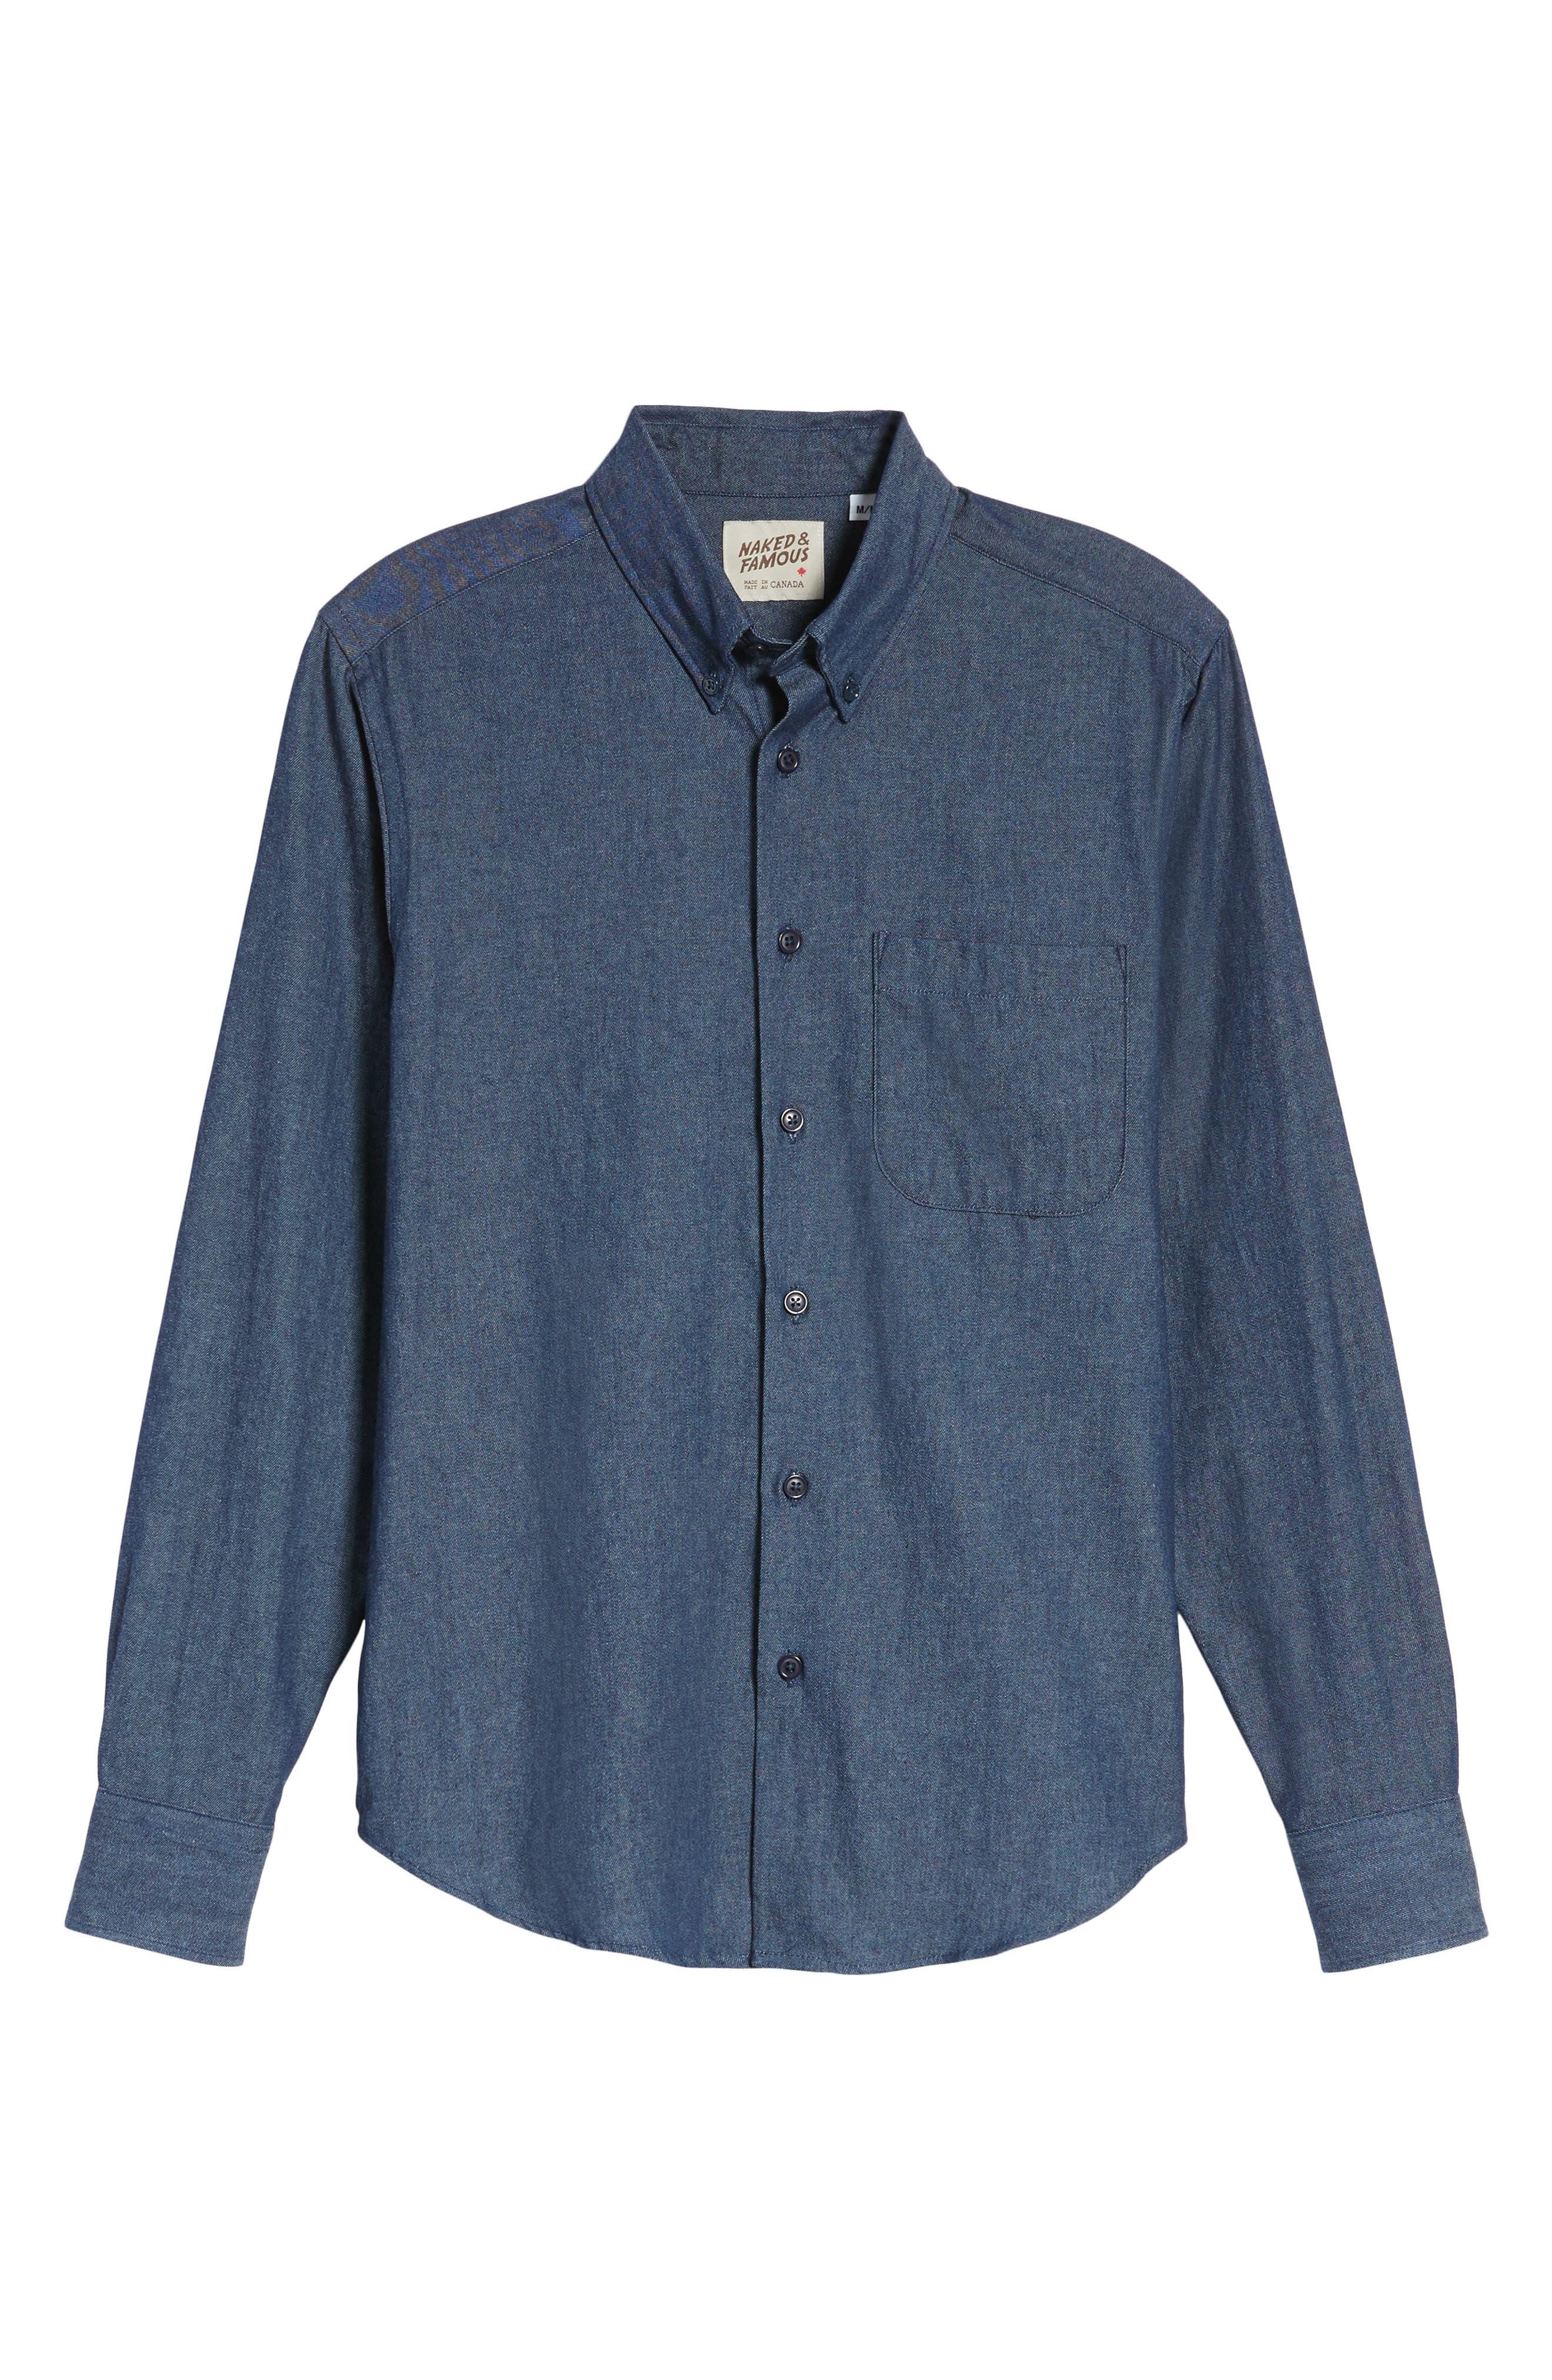 Indigo Long Sleeve Shirt,                             Alternate thumbnail 6, color,                             401